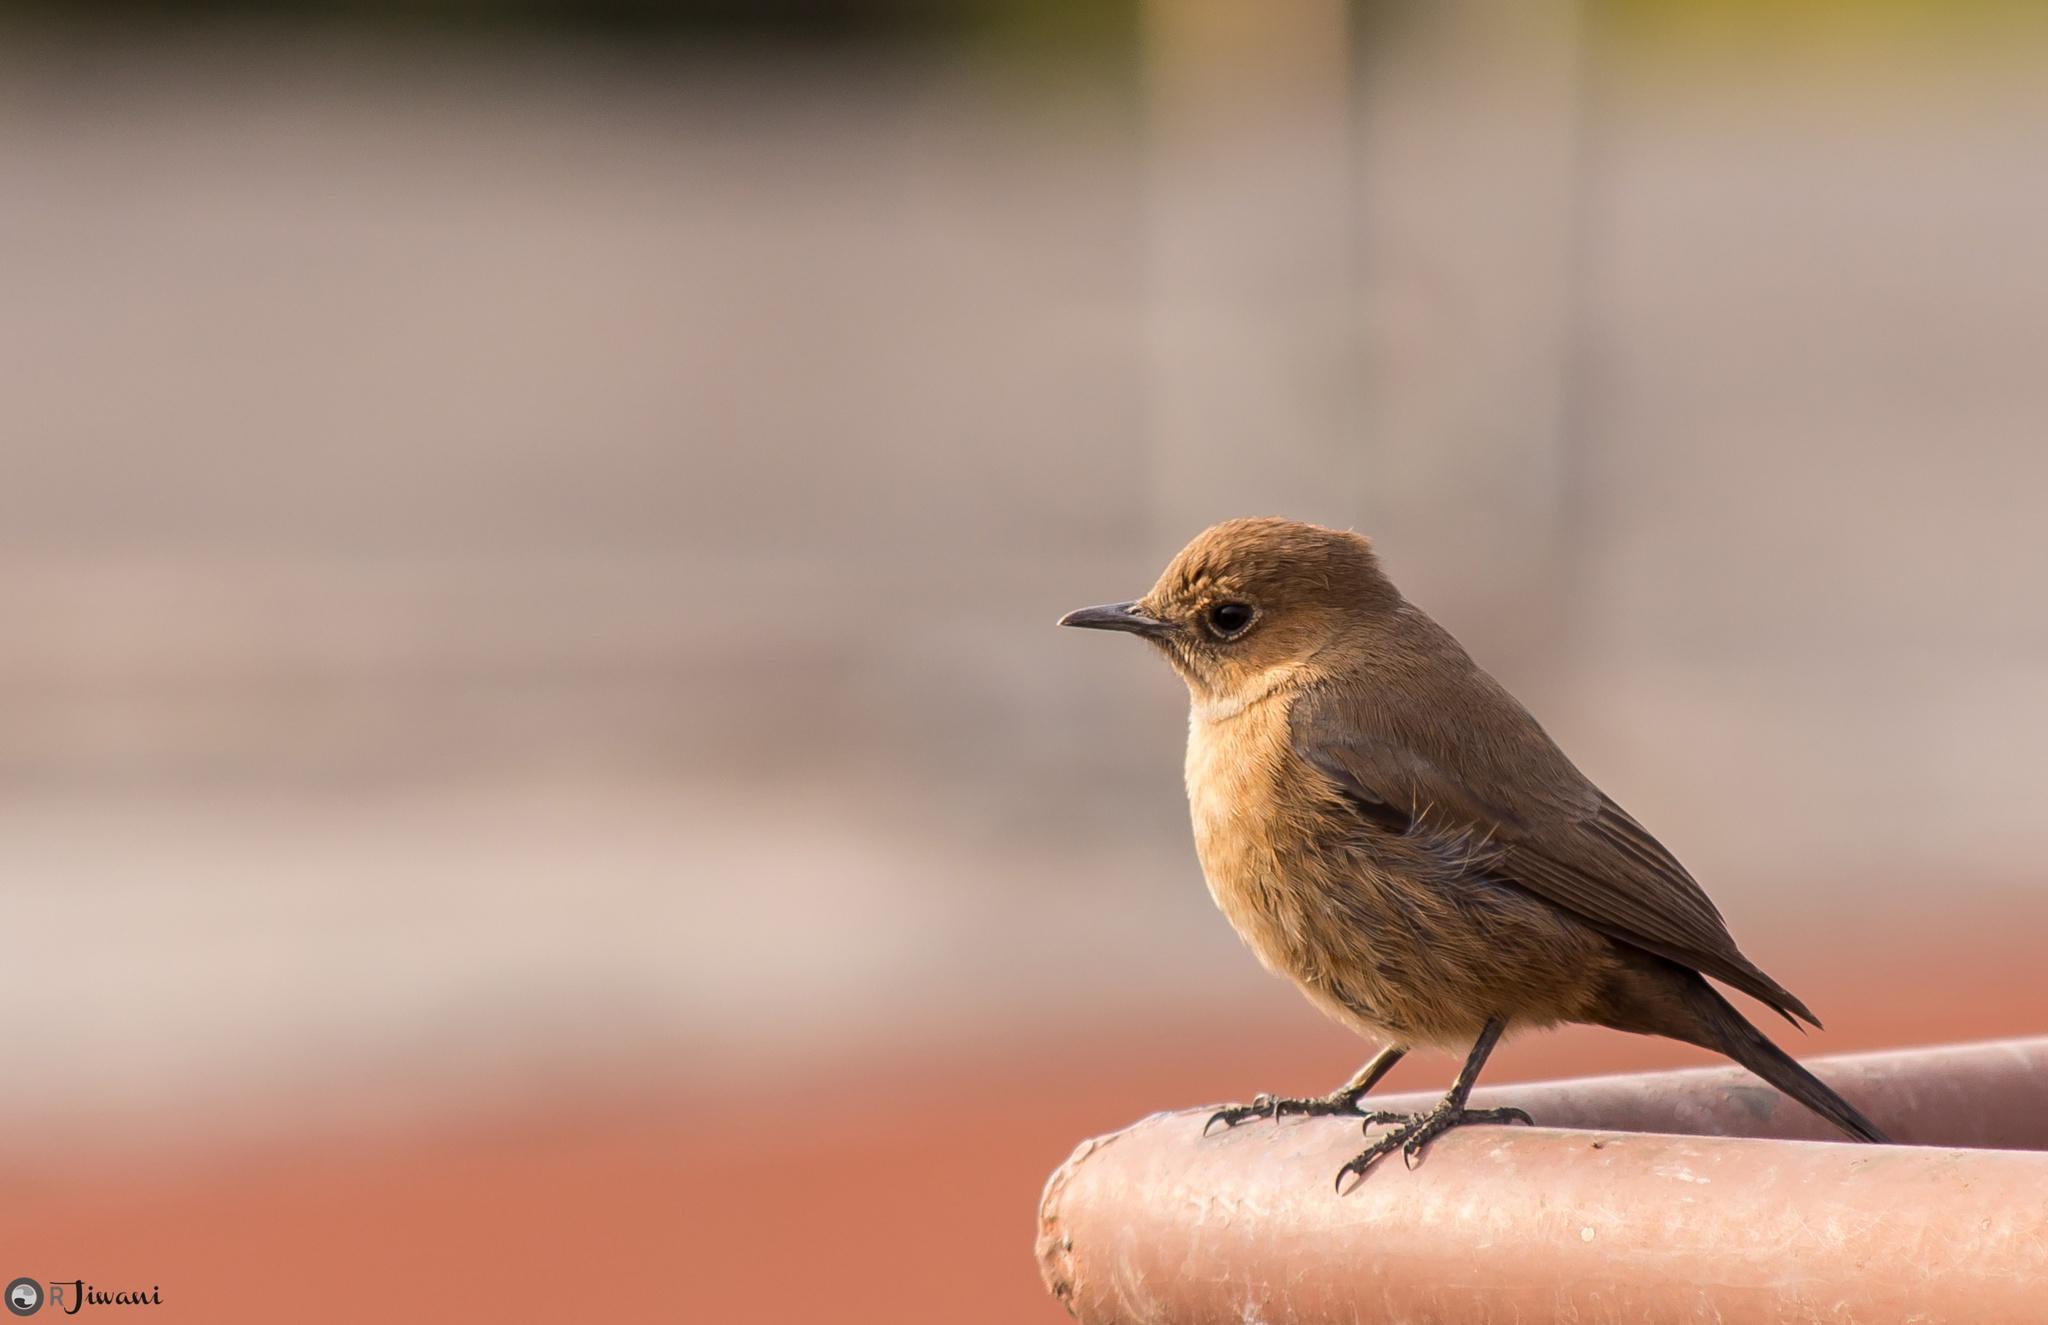 Lonely Bird by Rahim Jiwani